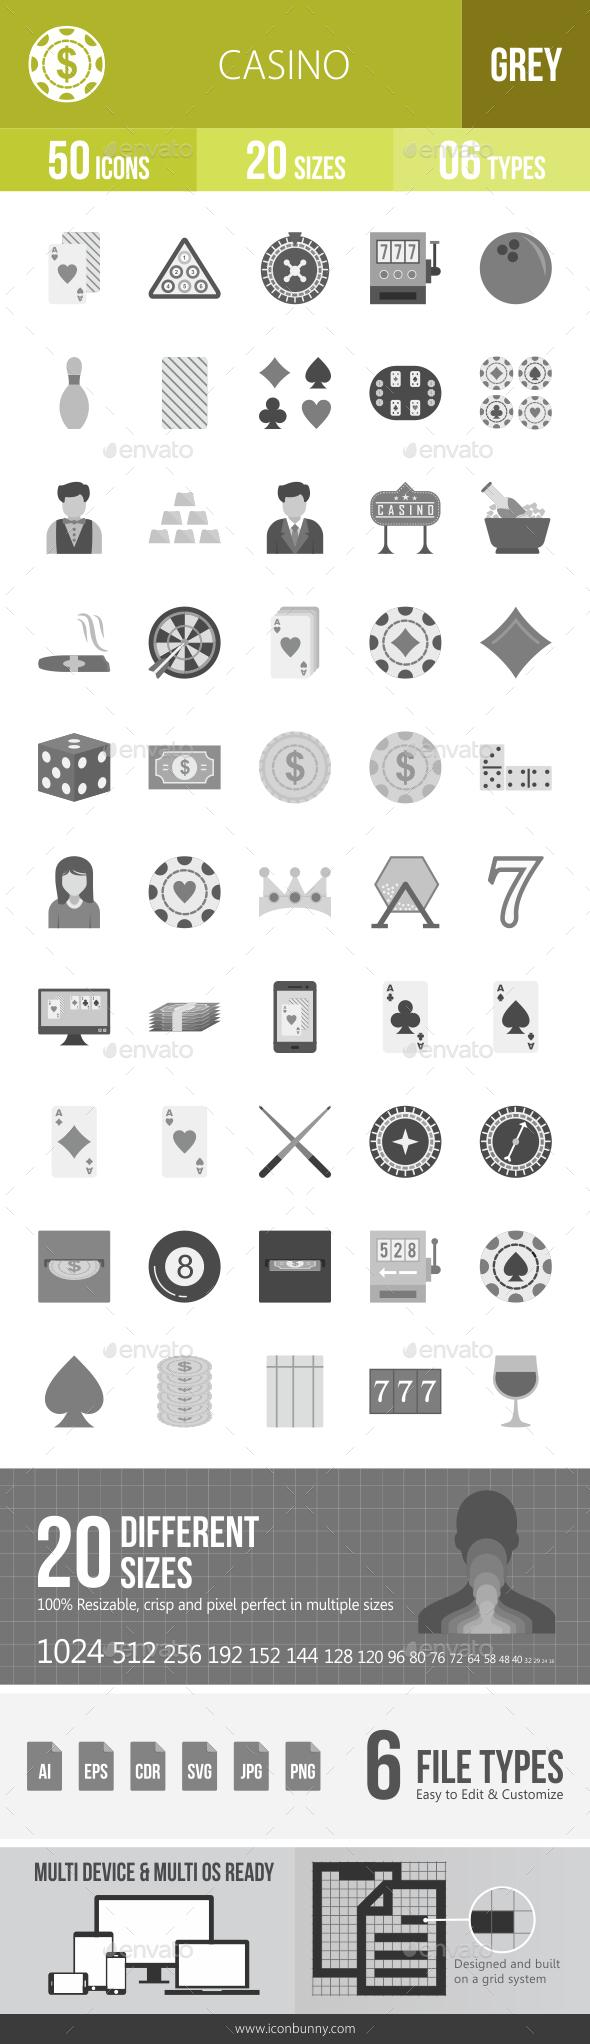 Casino Greyscale Icons - Icons